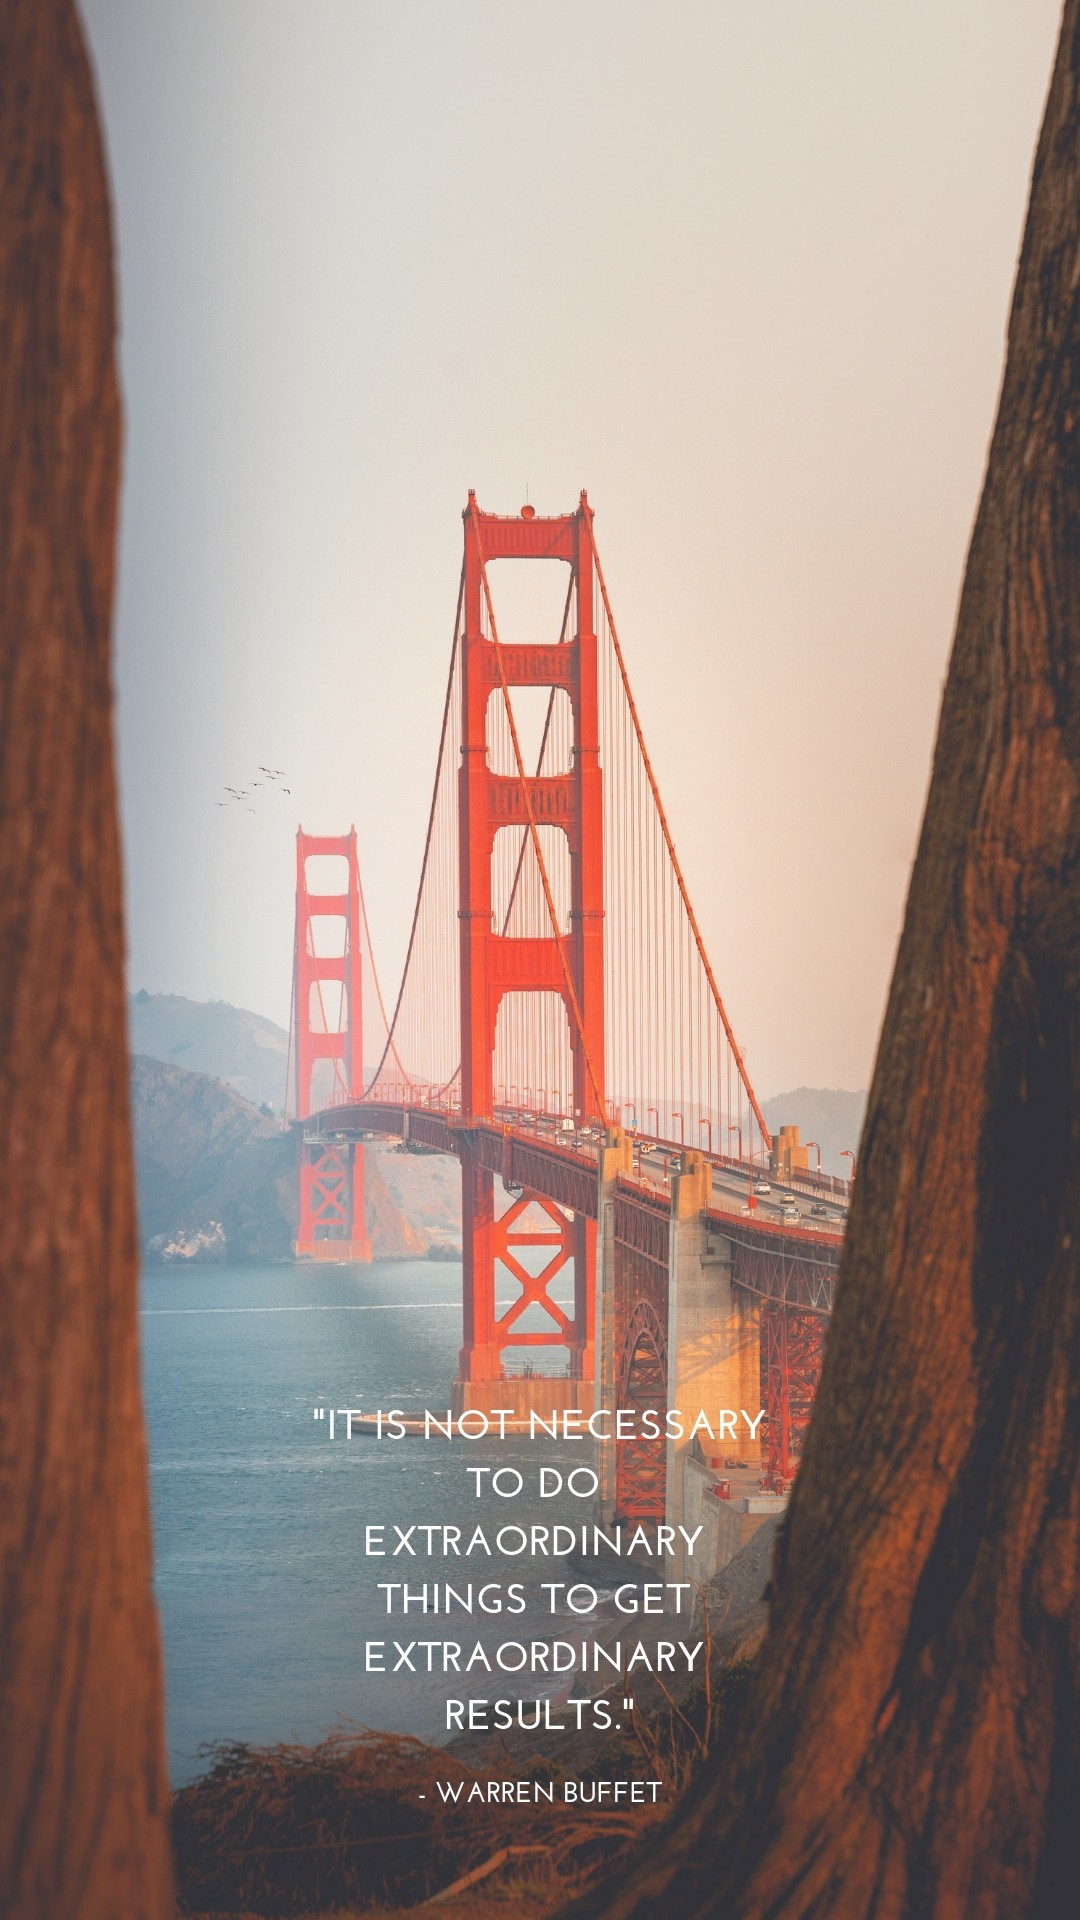 Golden Gate Bridge lock screen wallpaper